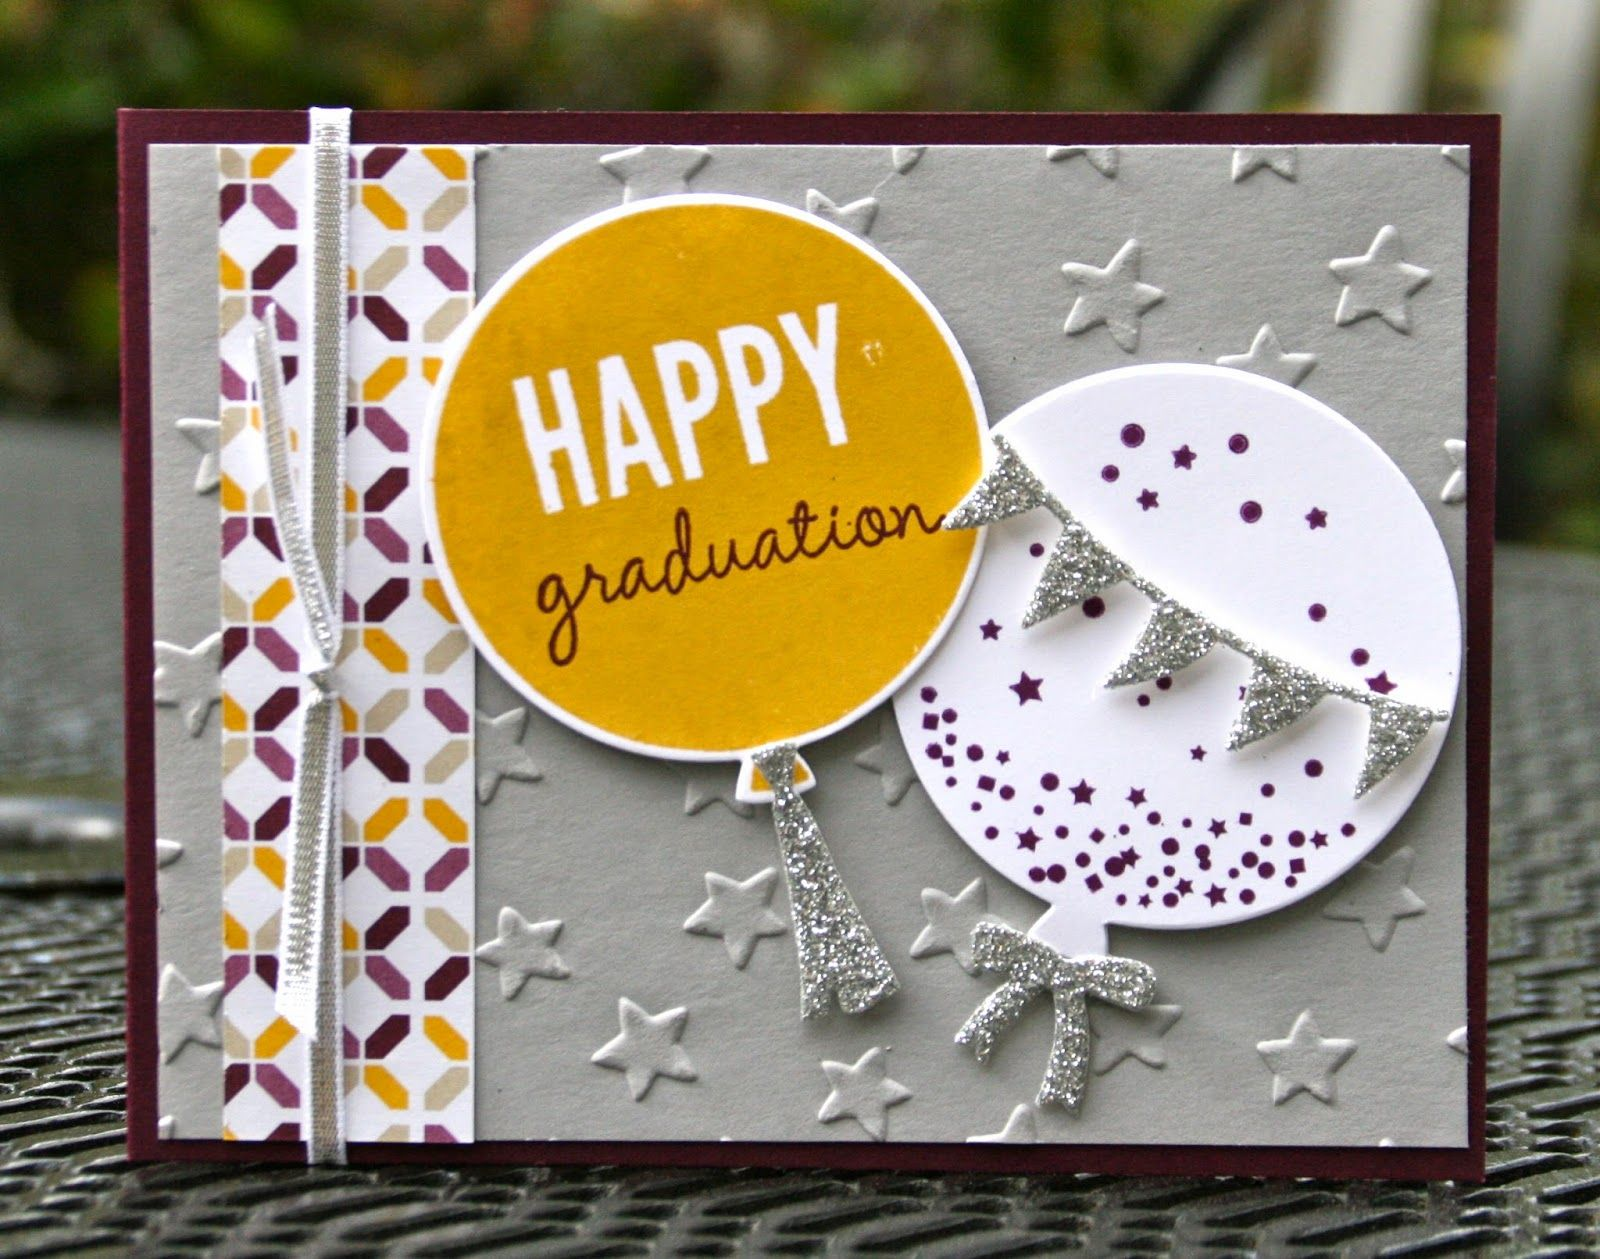 Krystal's Cards: Stampin' Up! Celebrate Today Crushed Blackberry #stampinup #celebratetoday #graduationcard #stampsomething #krystals_cards